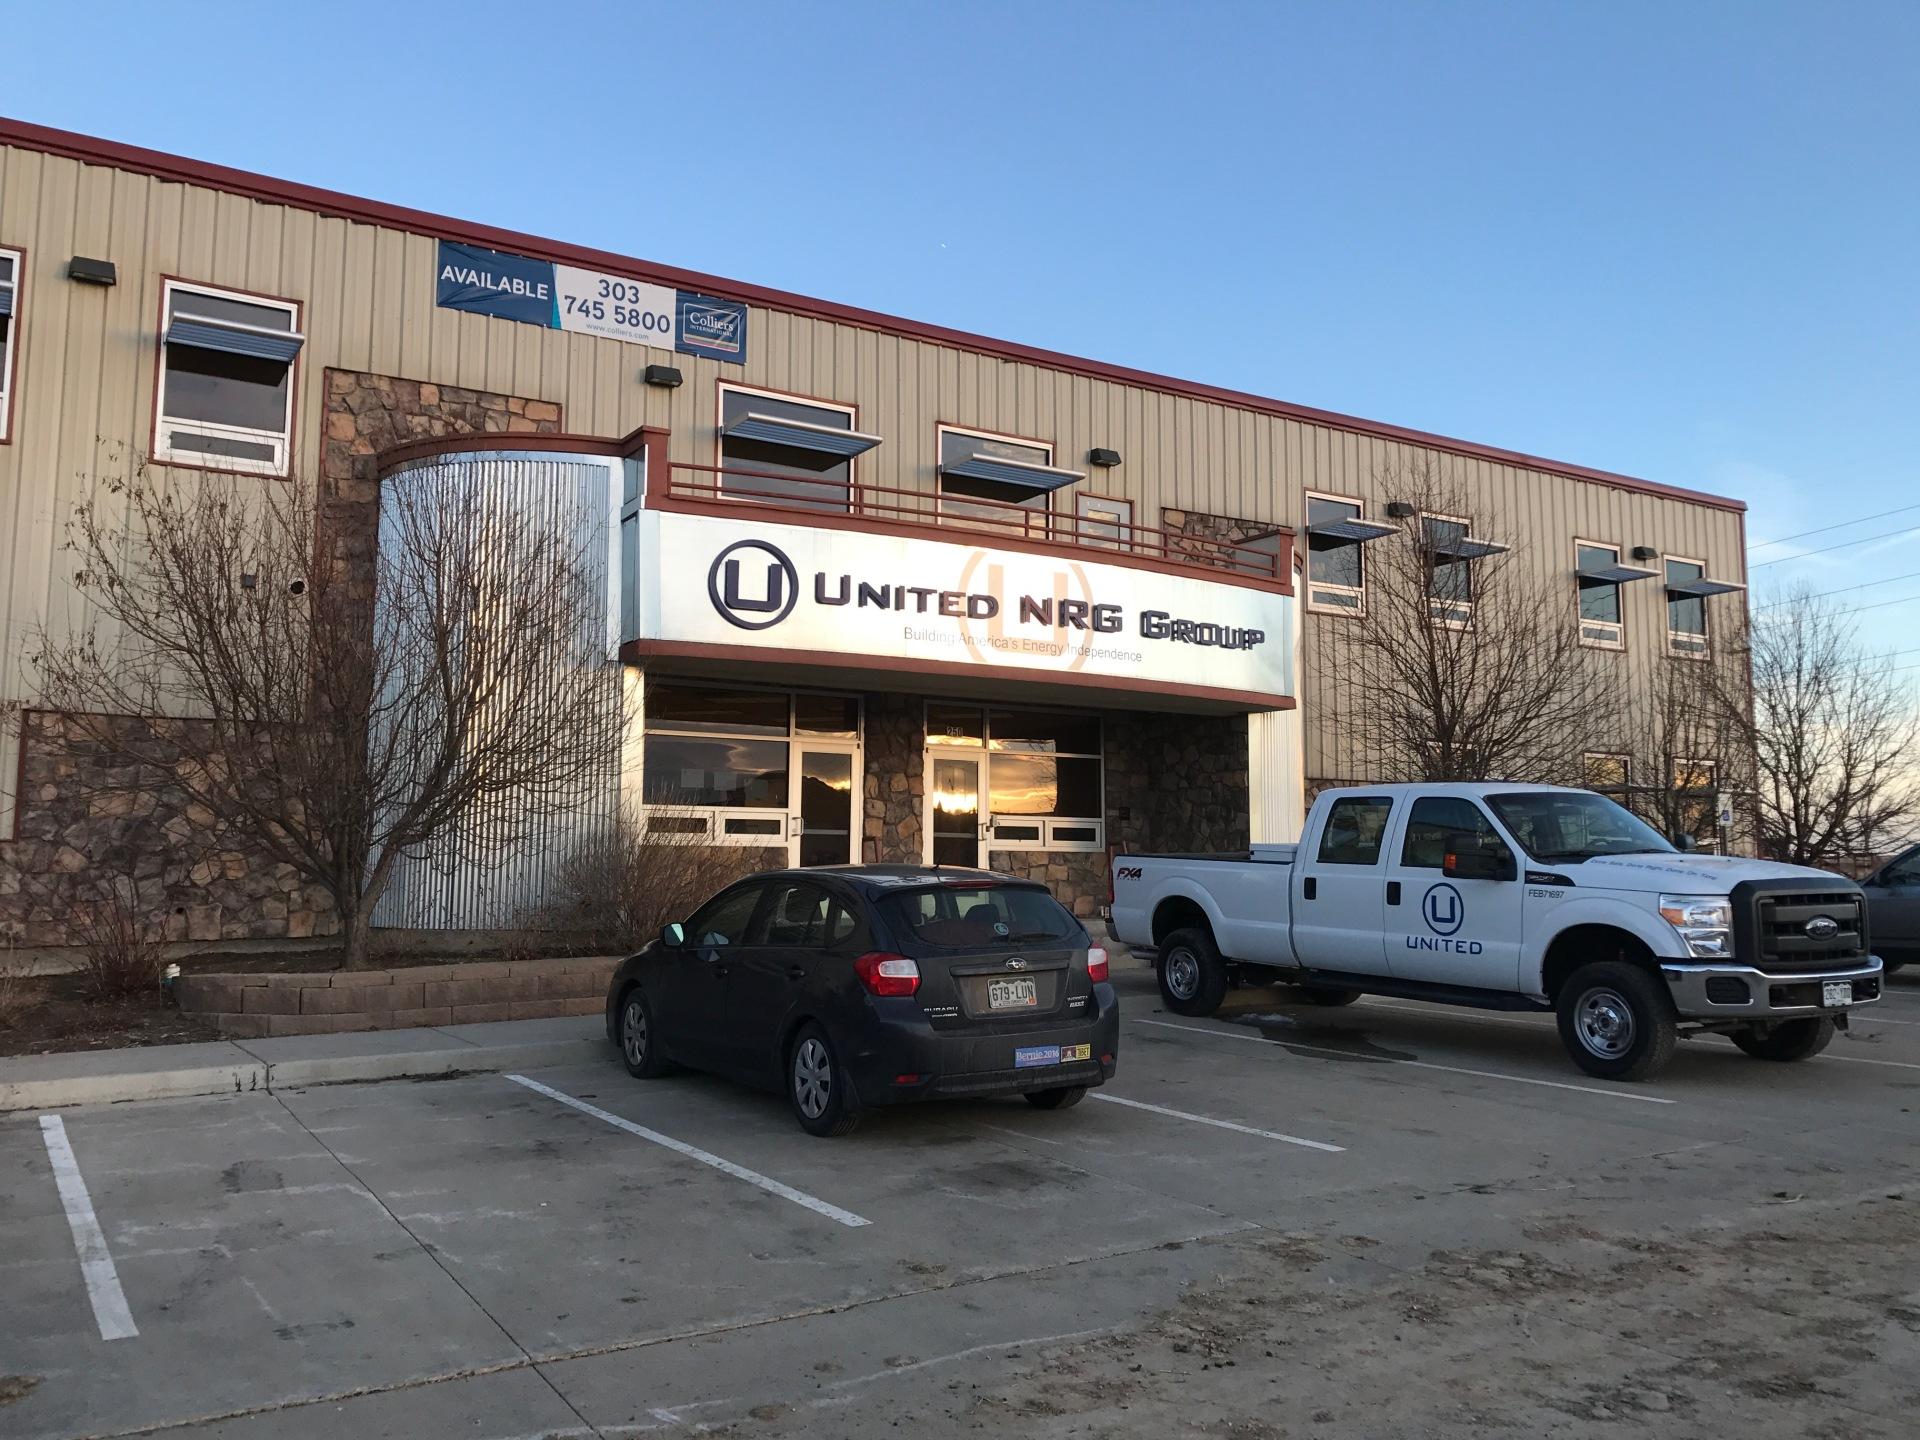 Commercial drive entrance